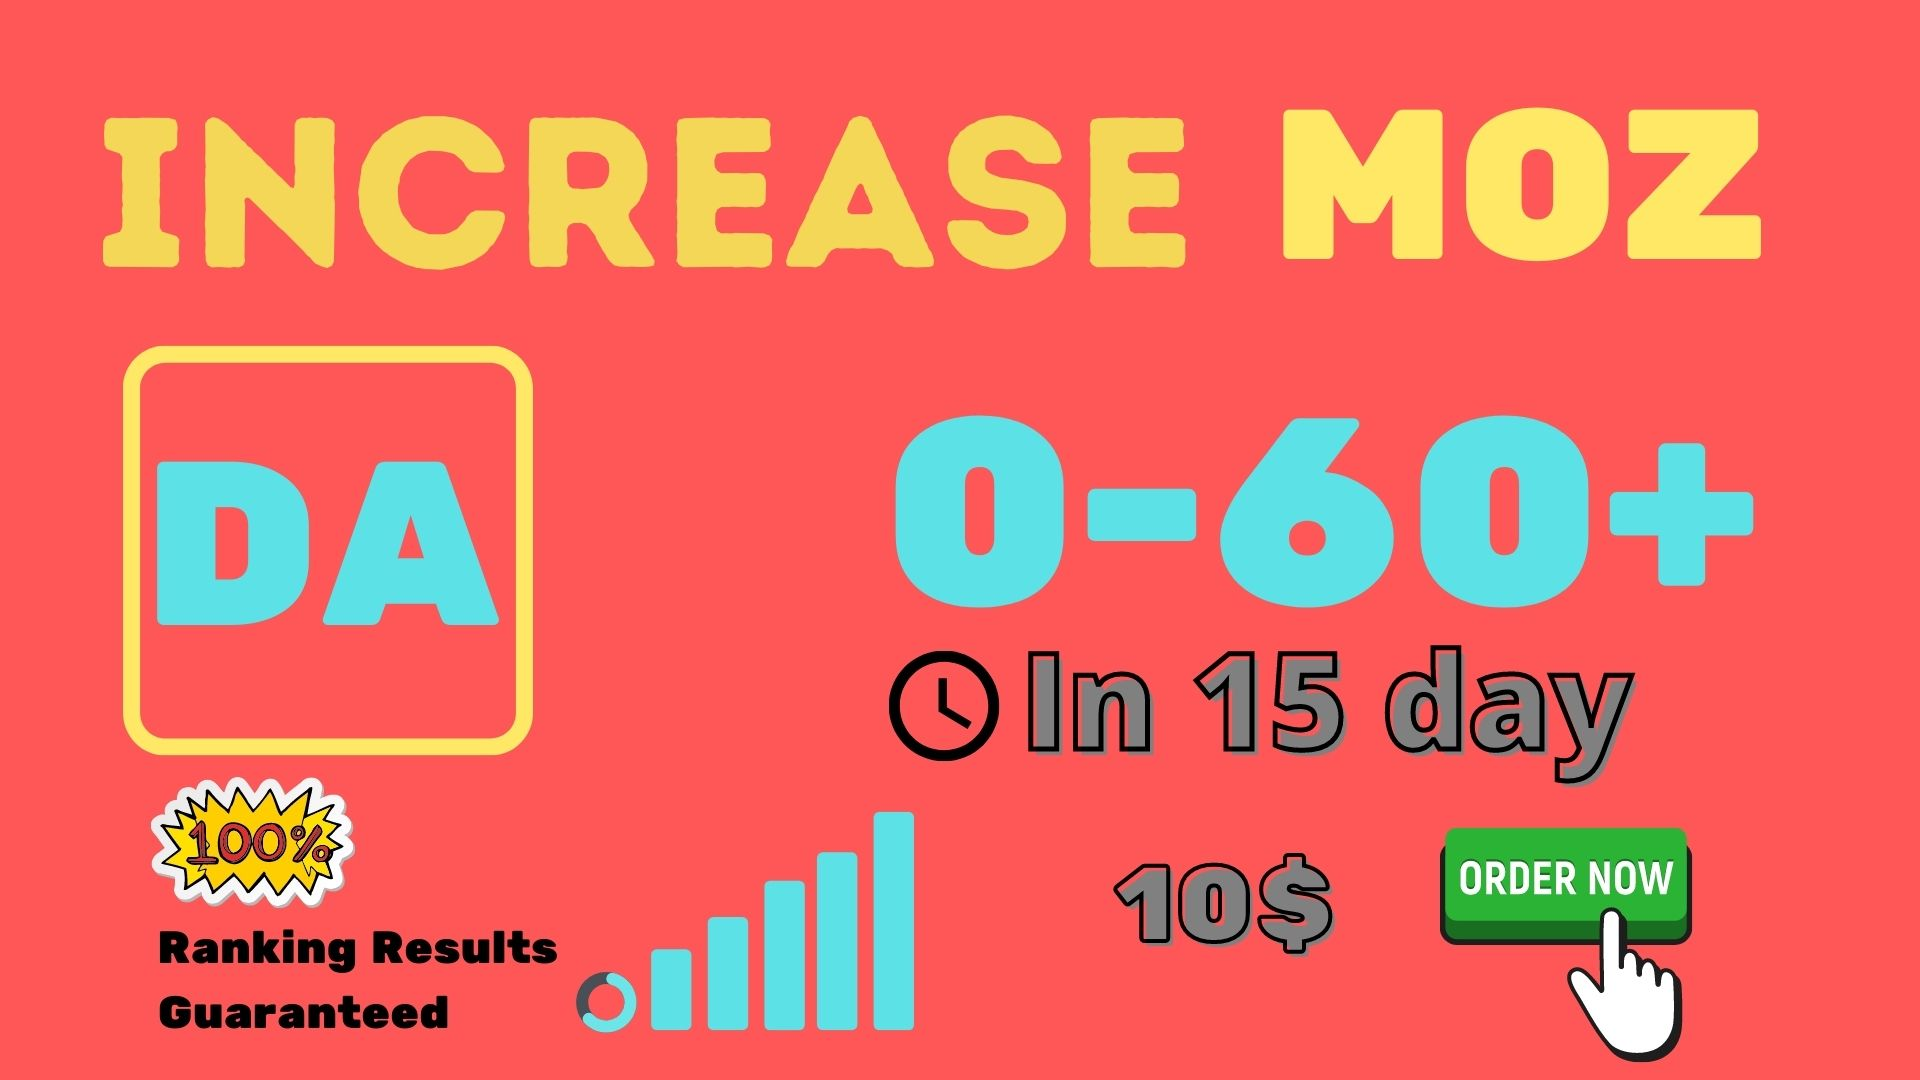 increase moz da domain authority 60 plus